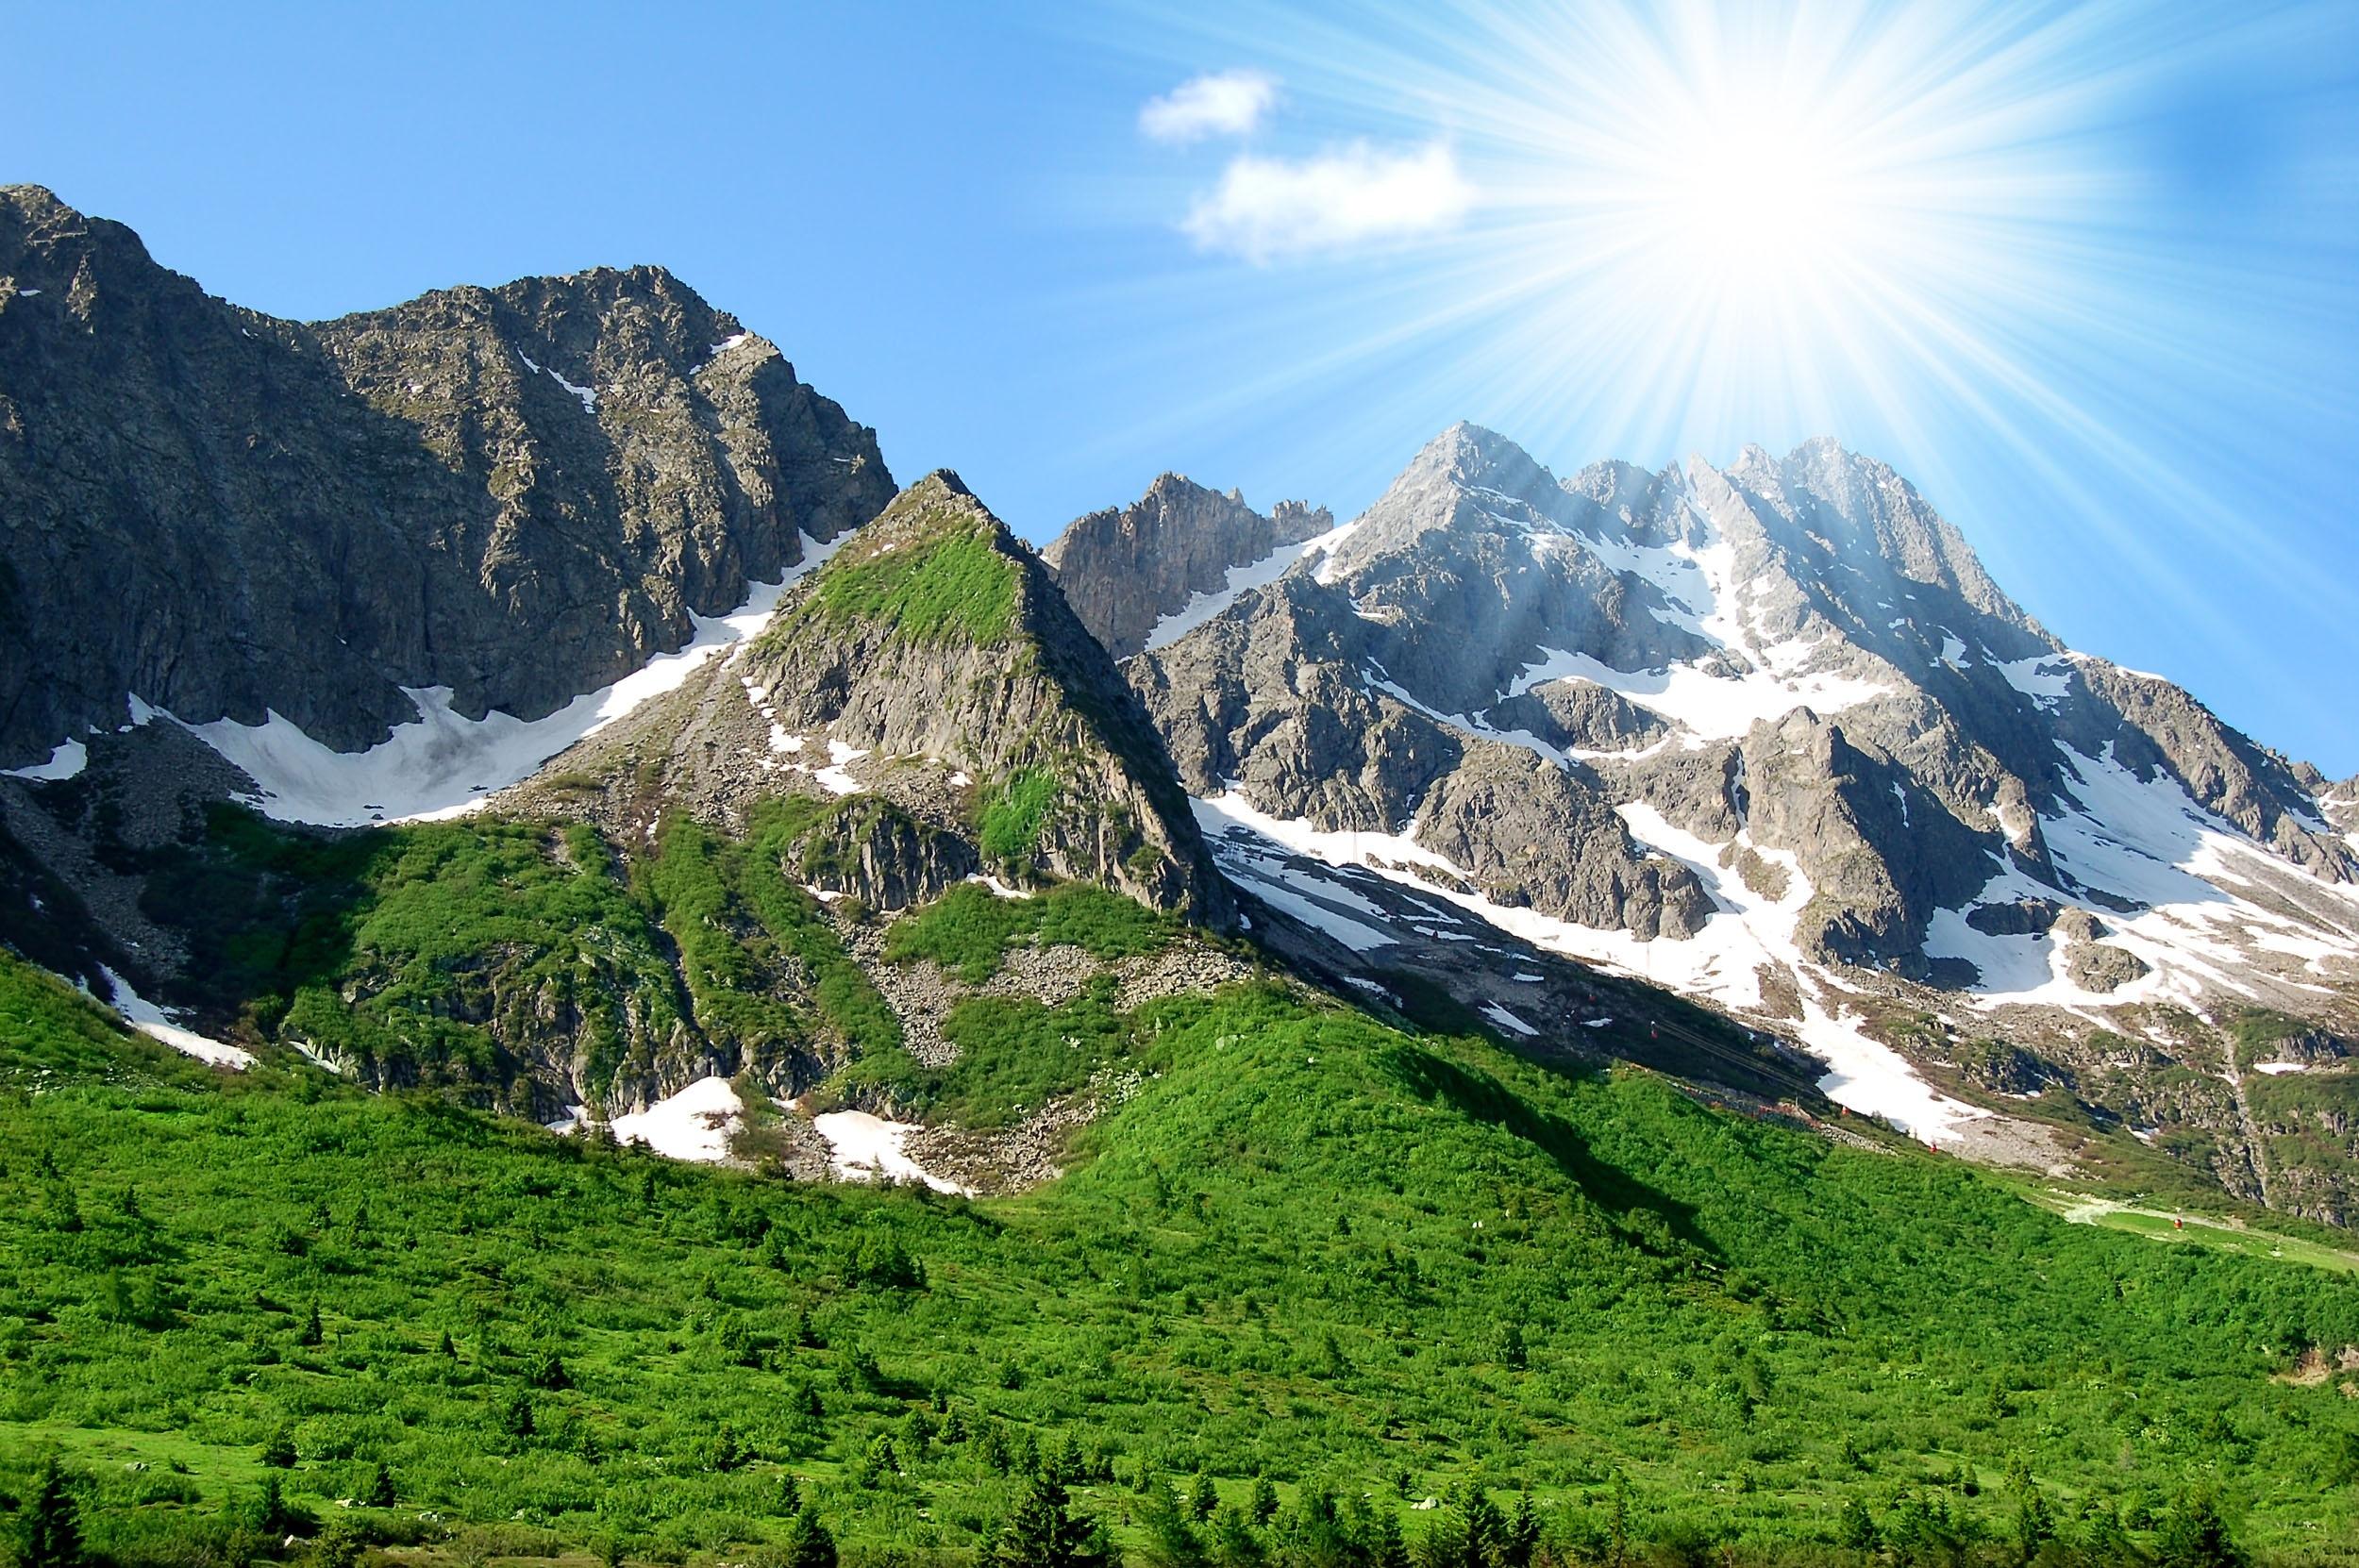 Vermiglio, Trentino-Alto Adige, Italy